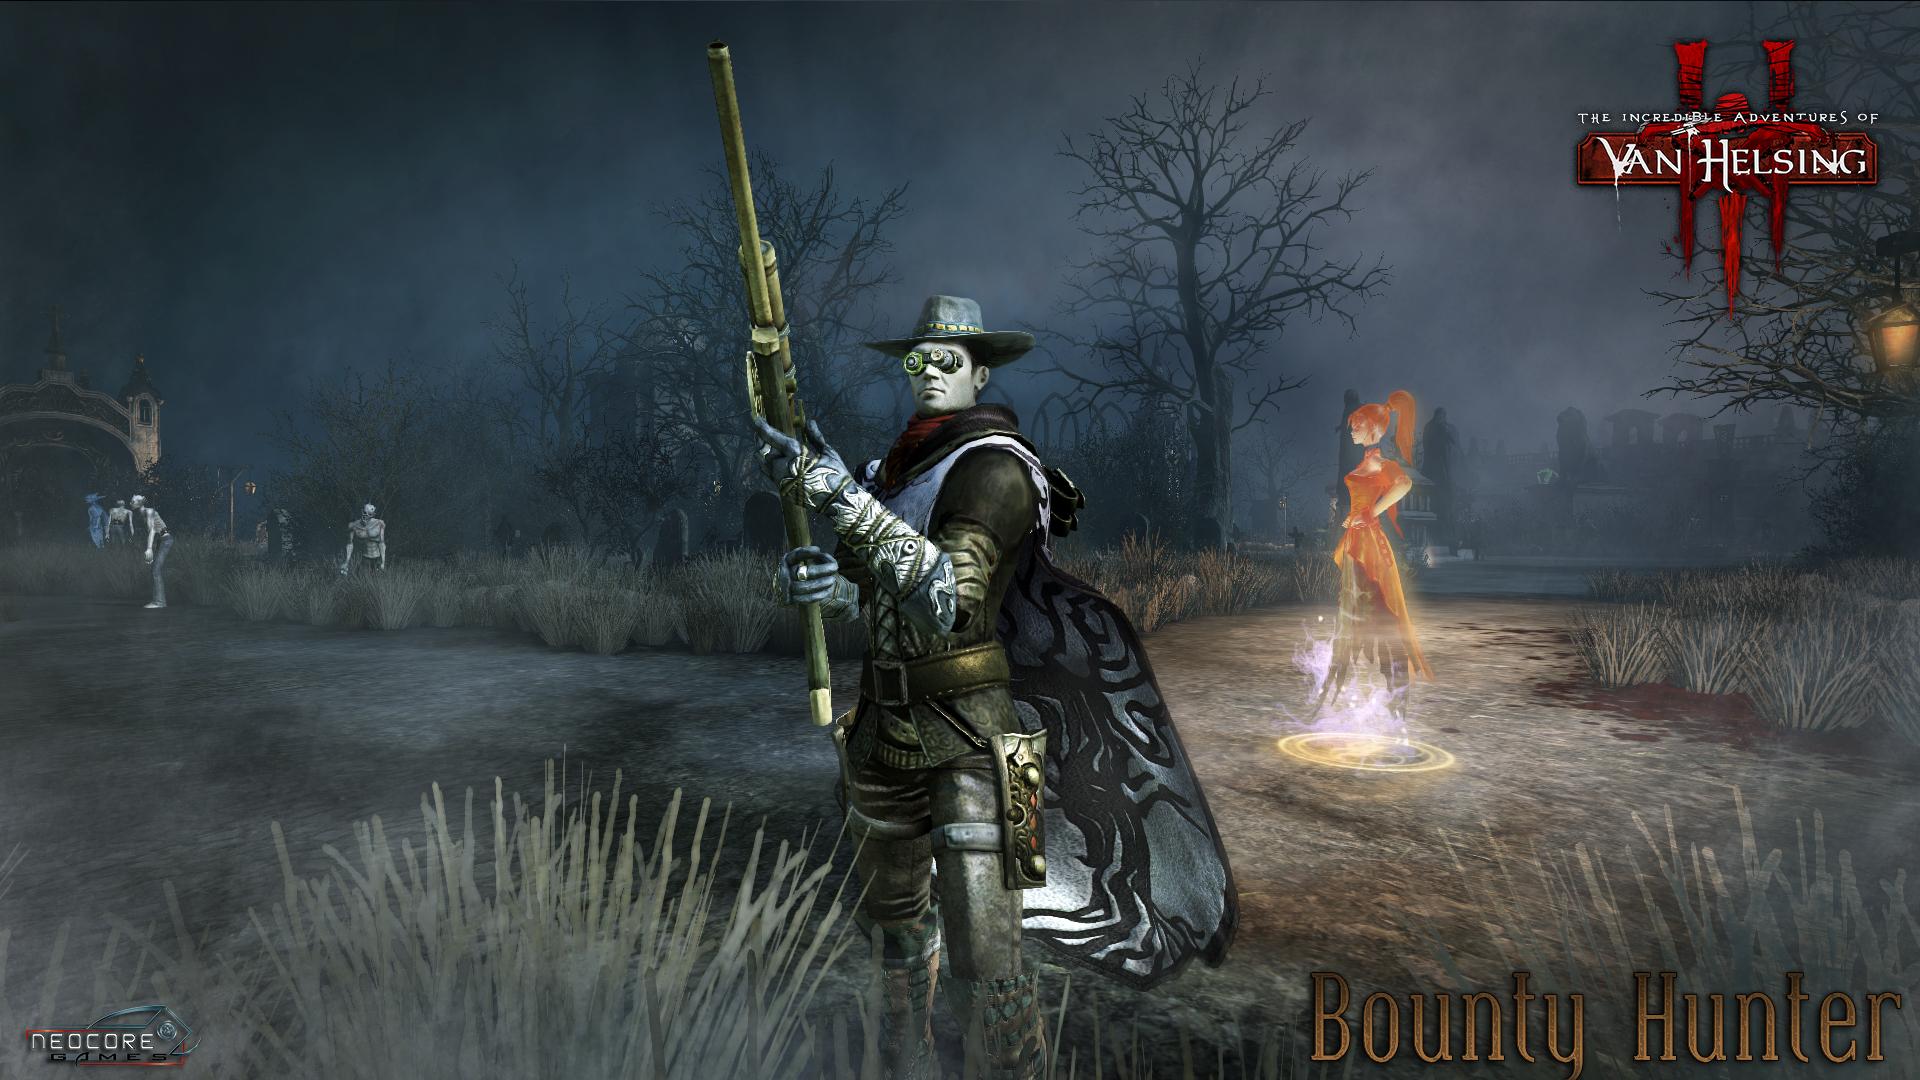 The Incredible Adventures of Van Helsing III screenshot